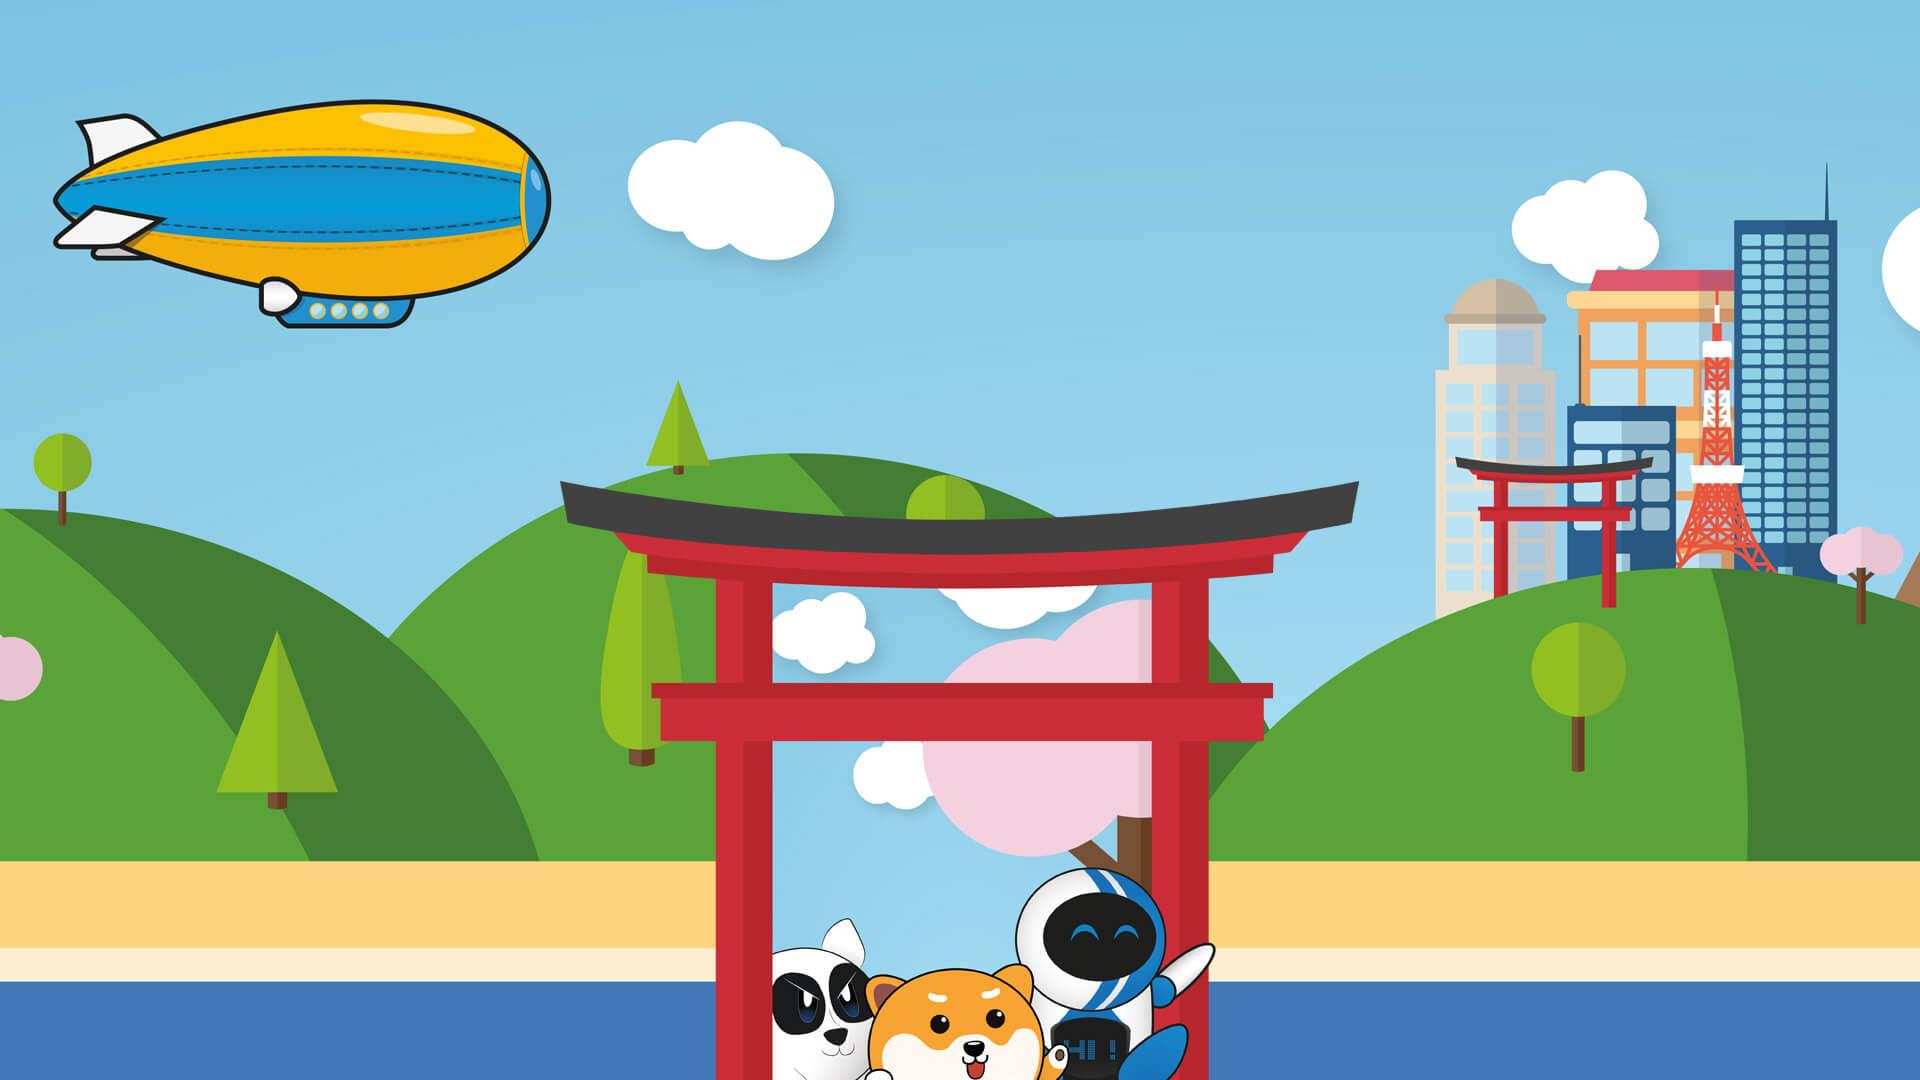 Illustration & Logo 2017 - Sketchbook by Tsukimori - Featured